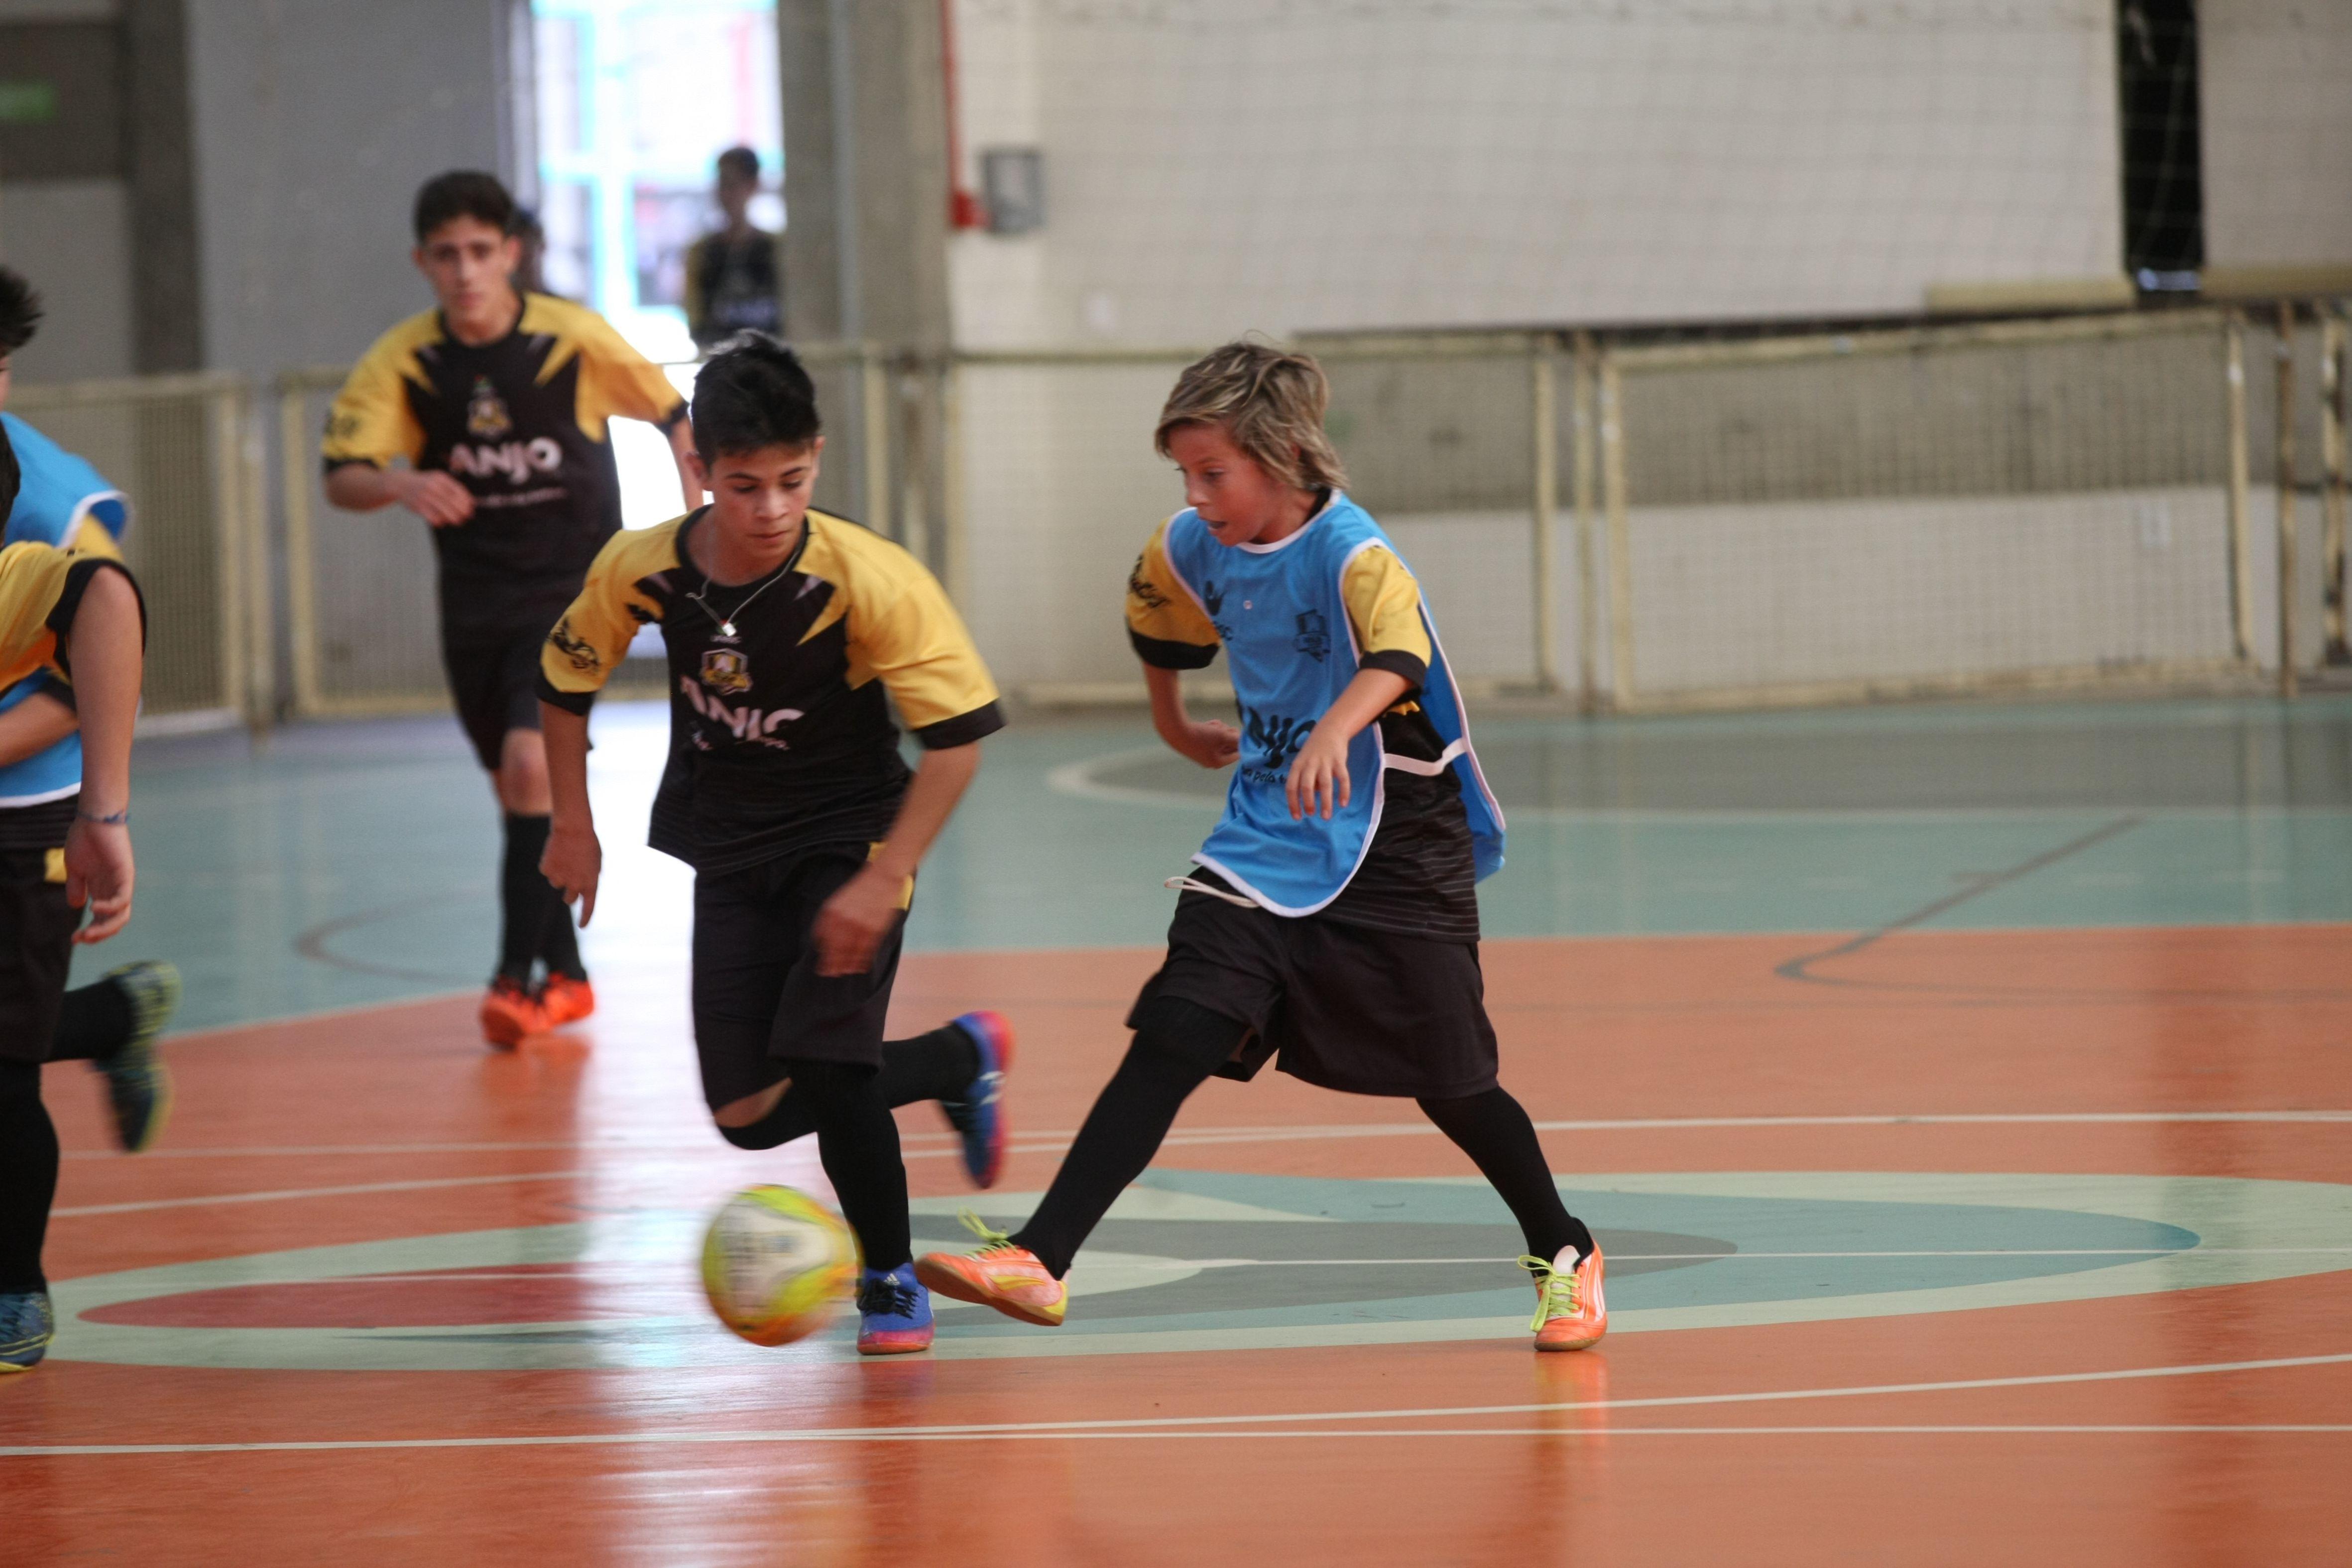 Começa a entrega dos uniformes do Anjos do Futsal - Anjos do ... ccdc577818a9f